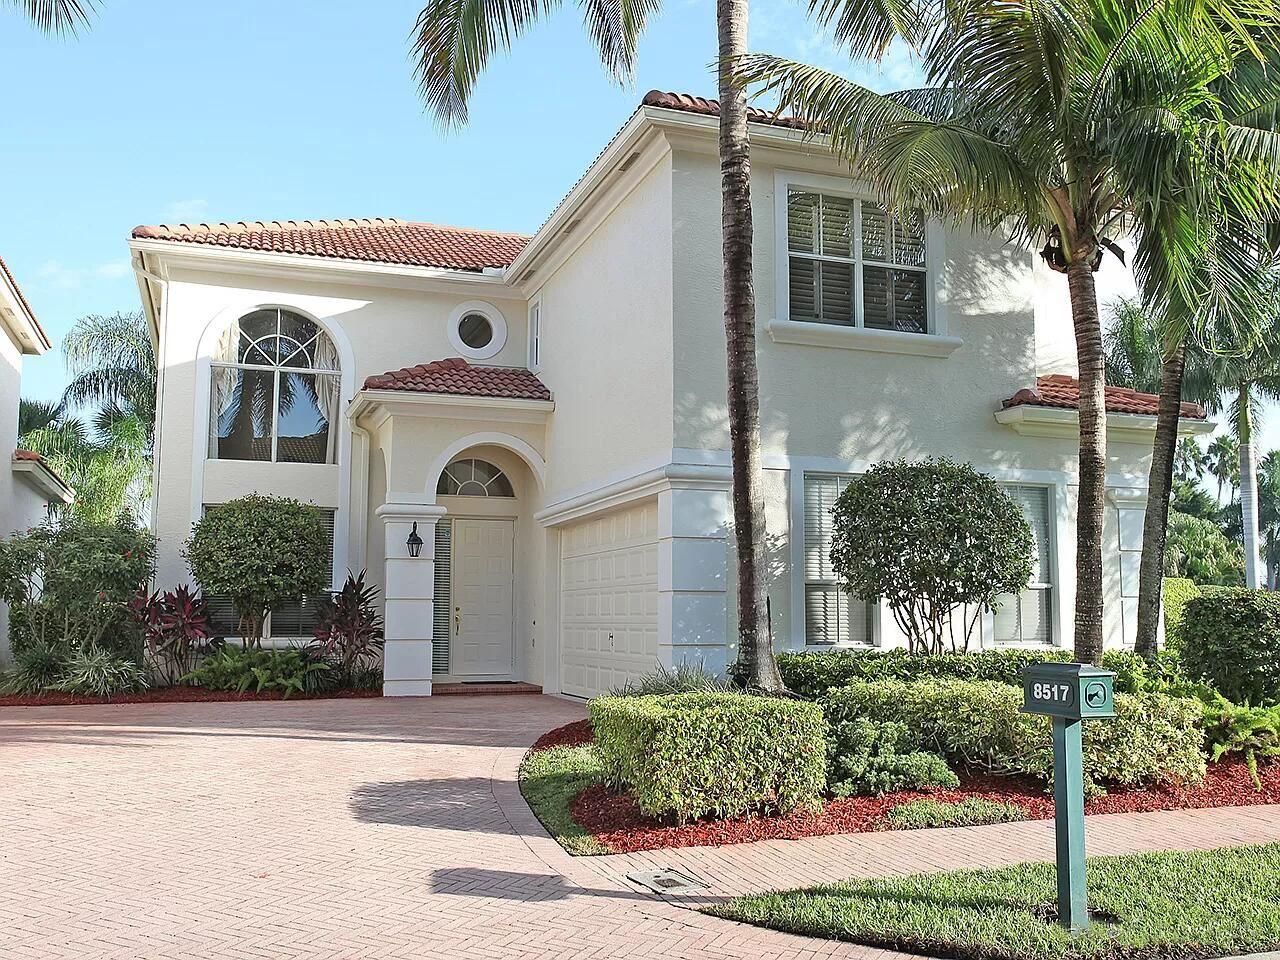 8517 Legend Club Drive, West Palm Beach, FL 33412 - MLS#: RX-10741235